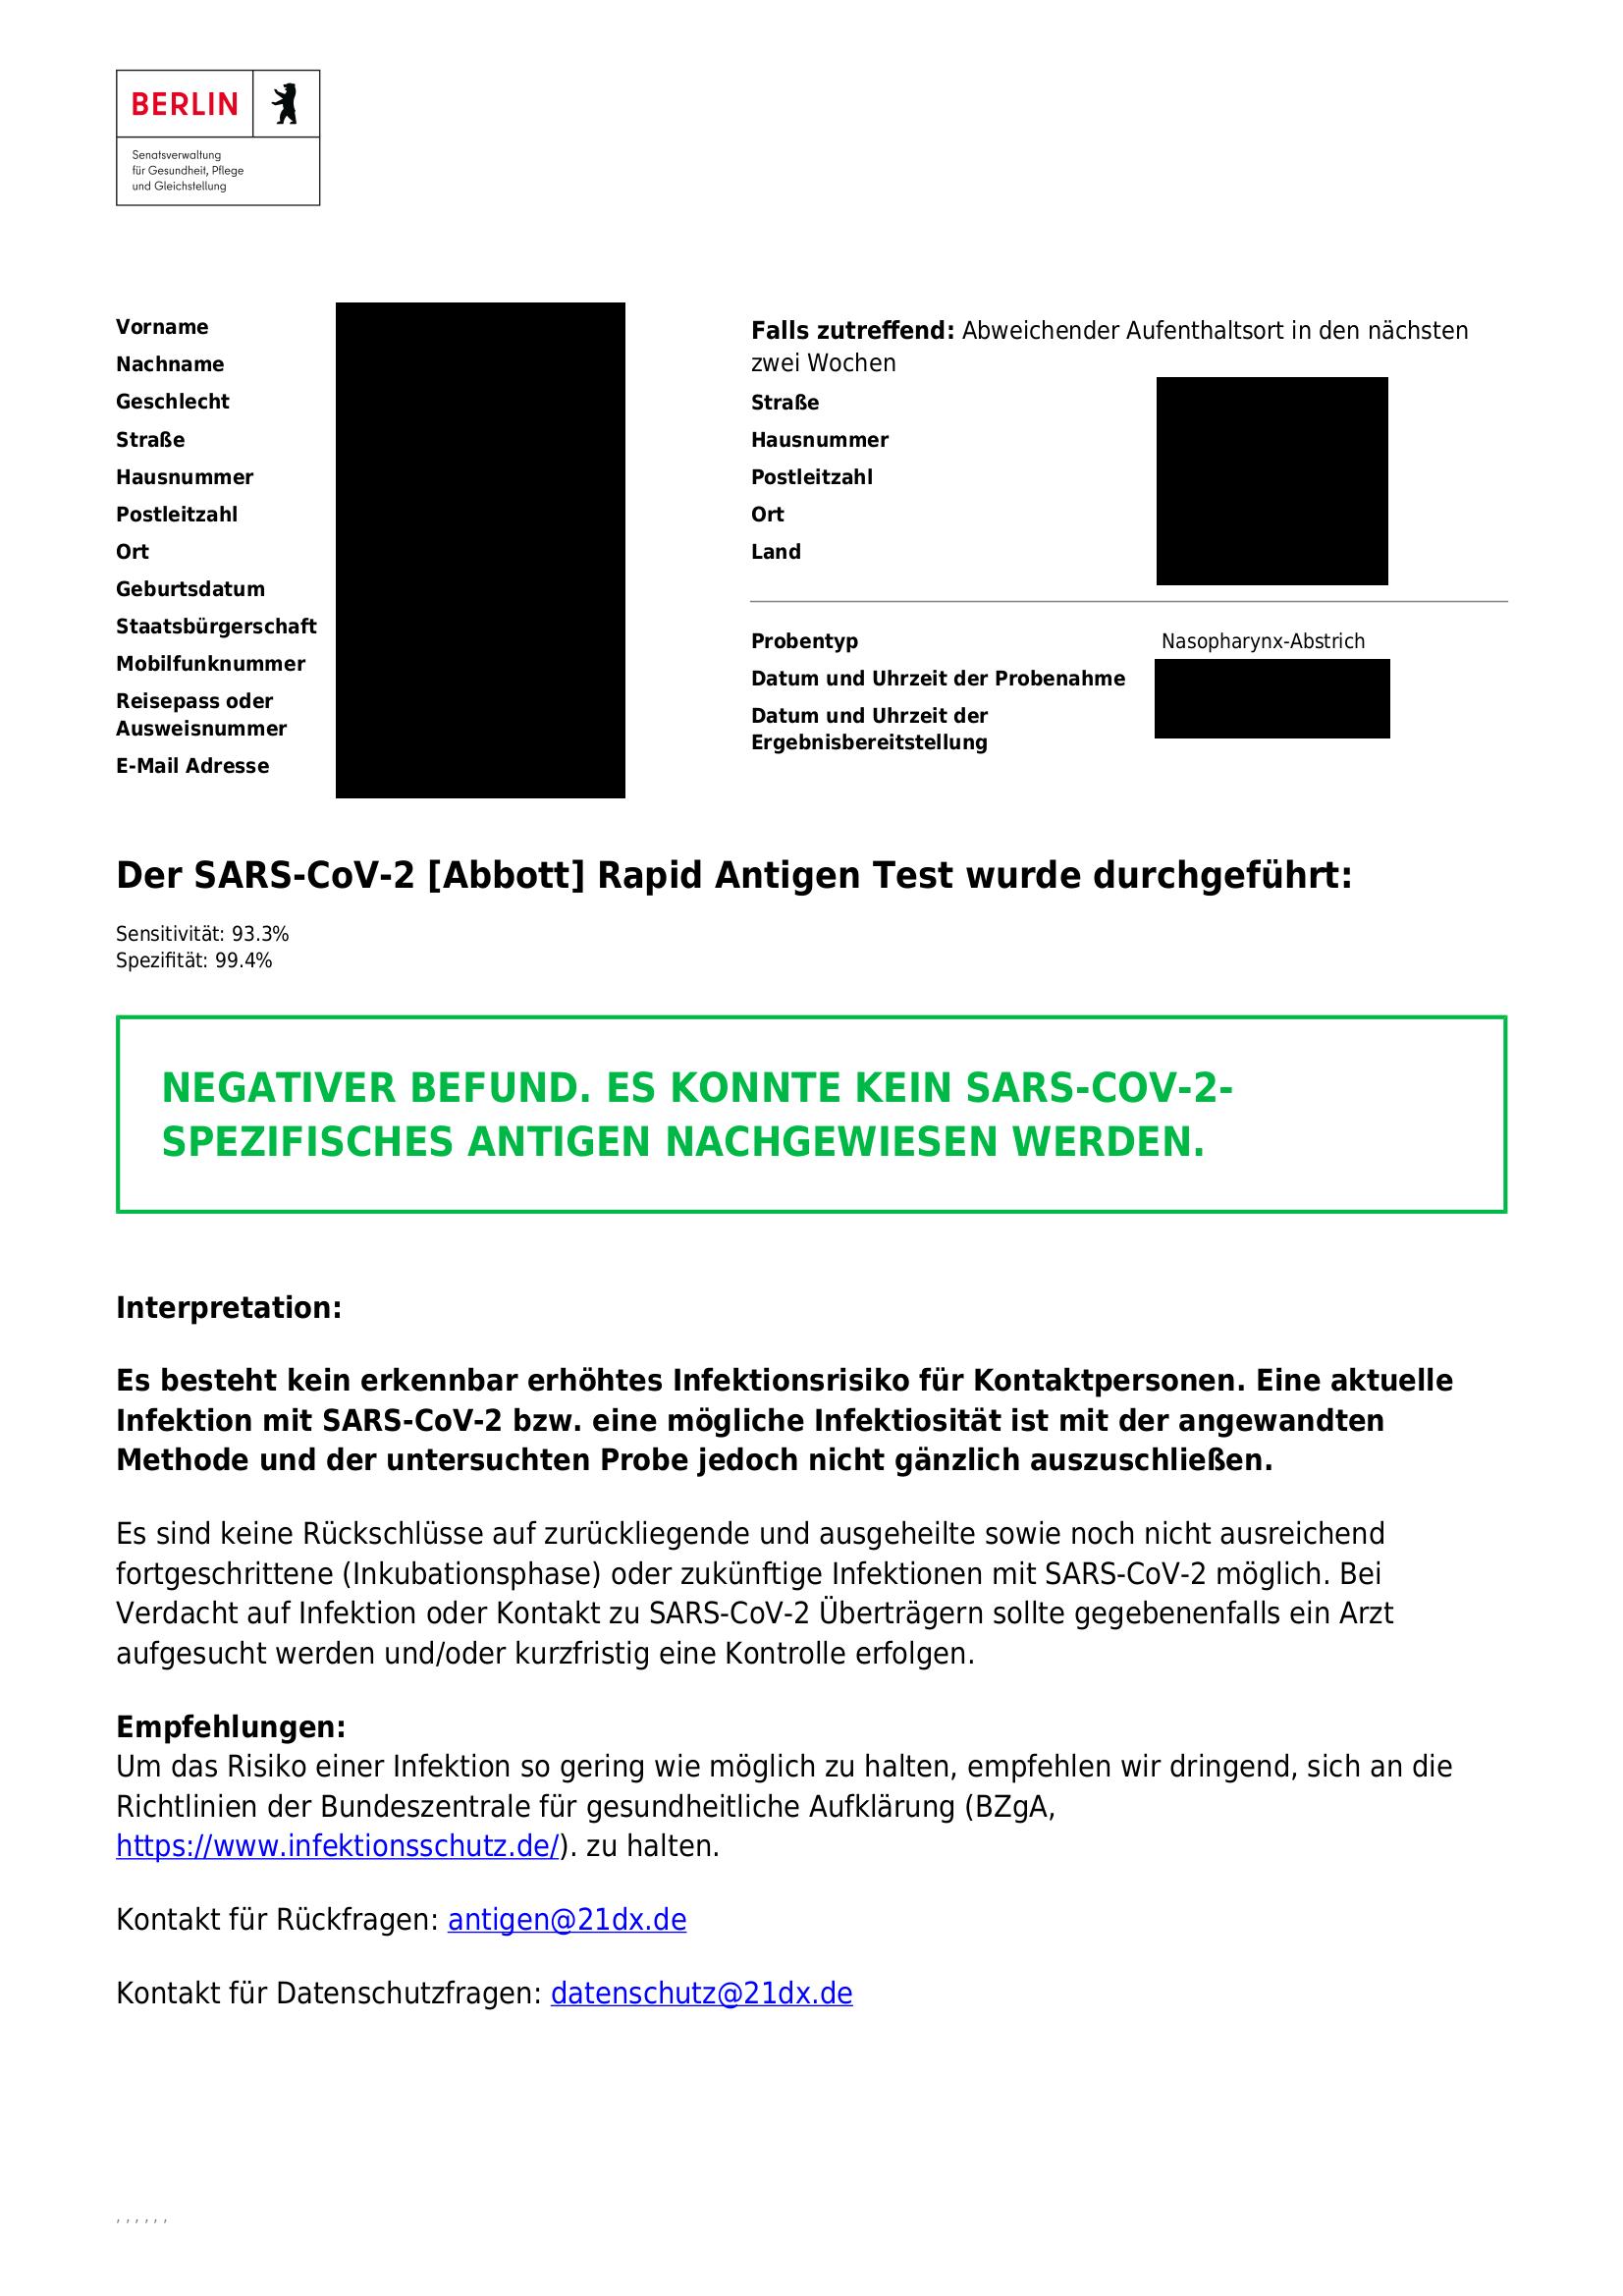 Negatives Testergebnis als PDF